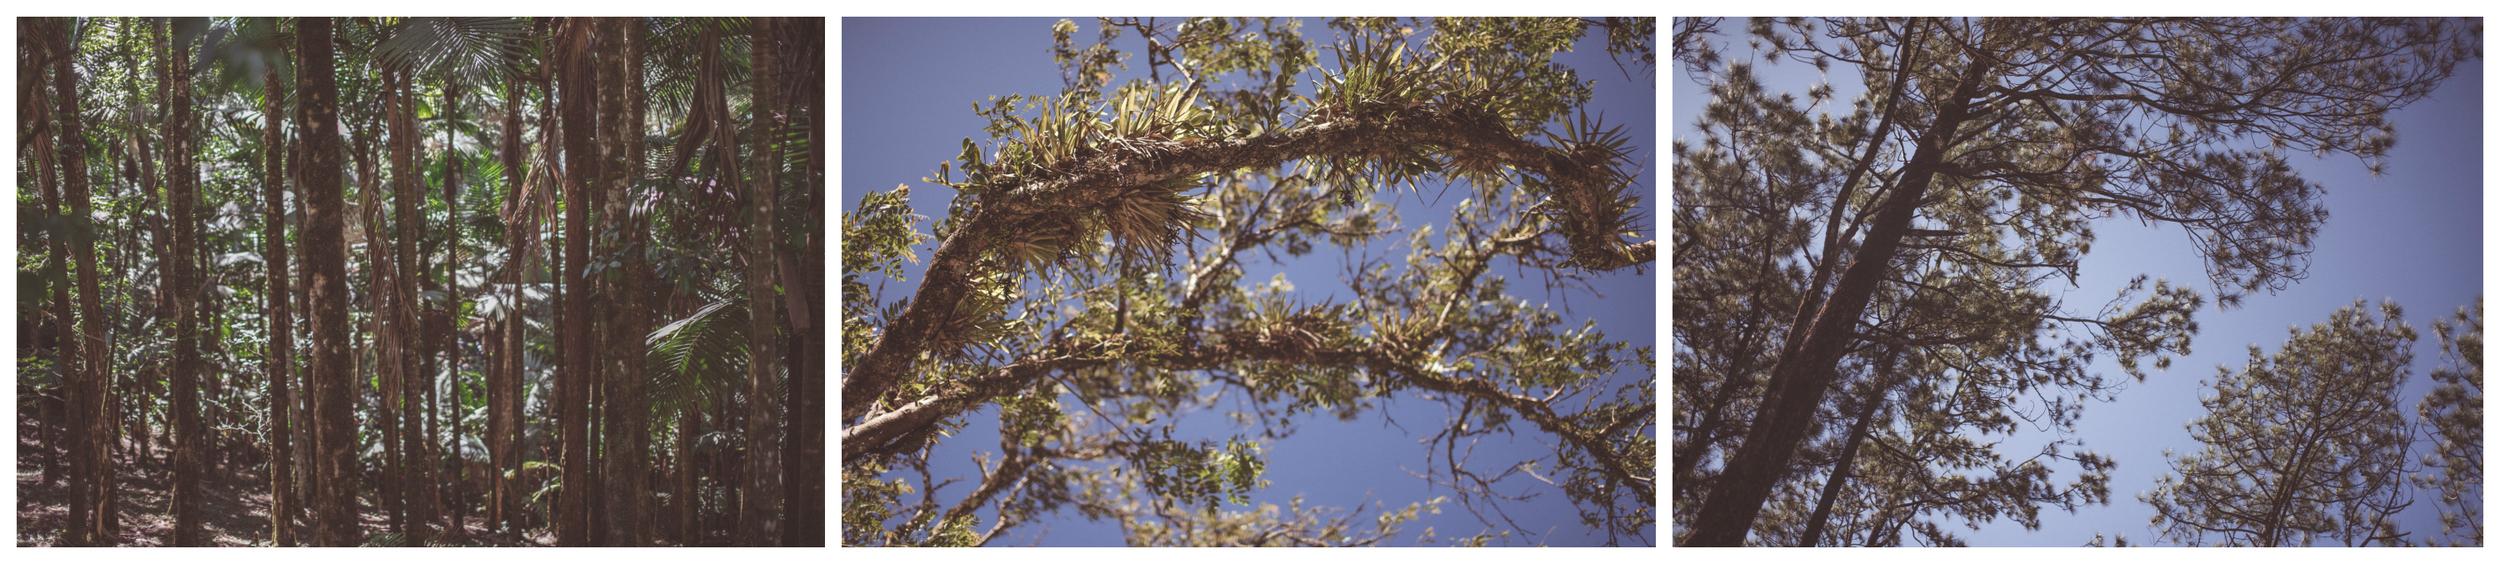 trail details 4.jpg